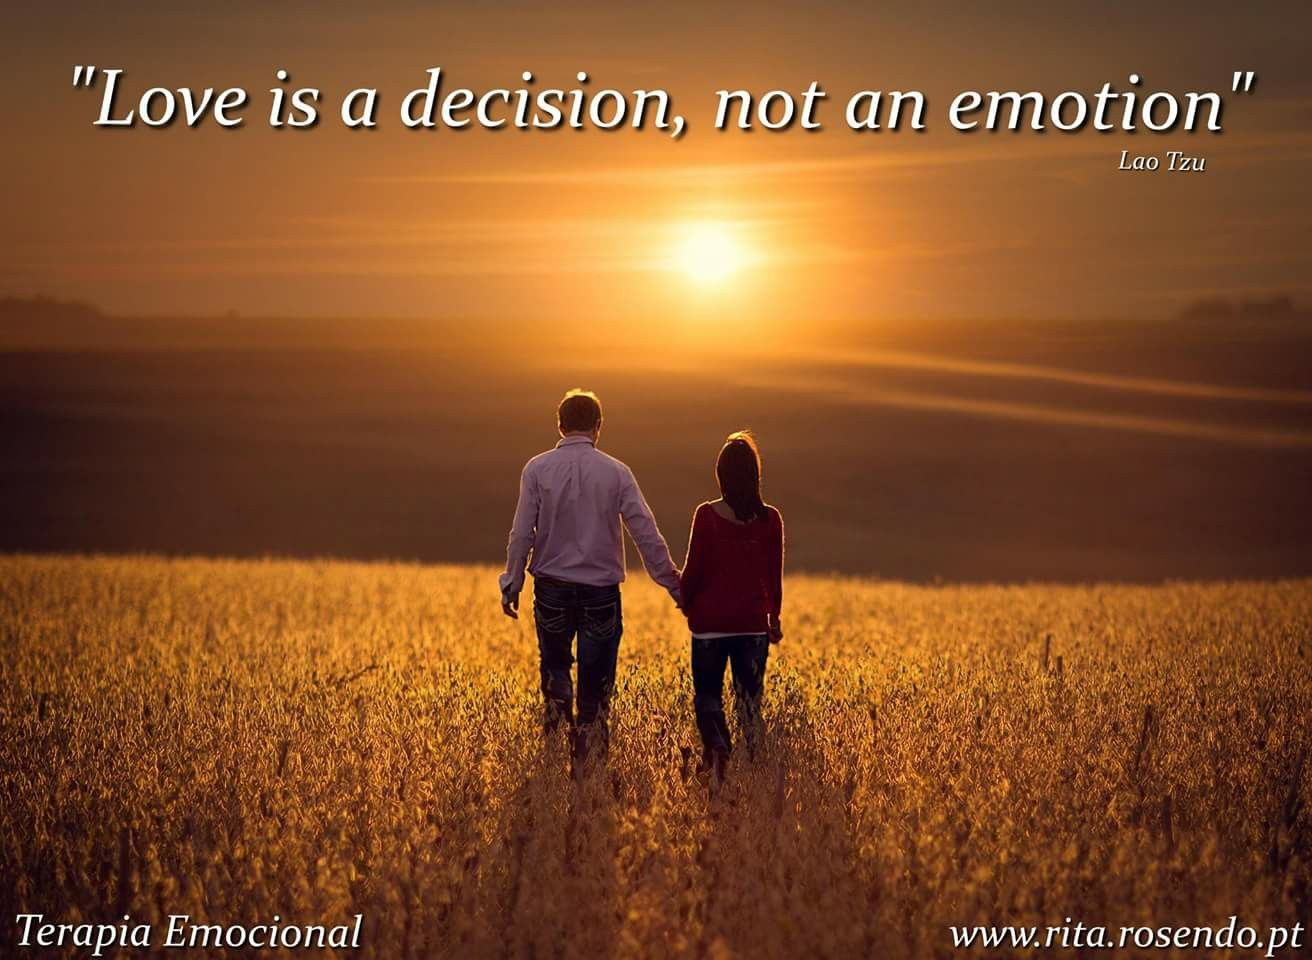 Terapia emocional - www.rita.rosendo.pt